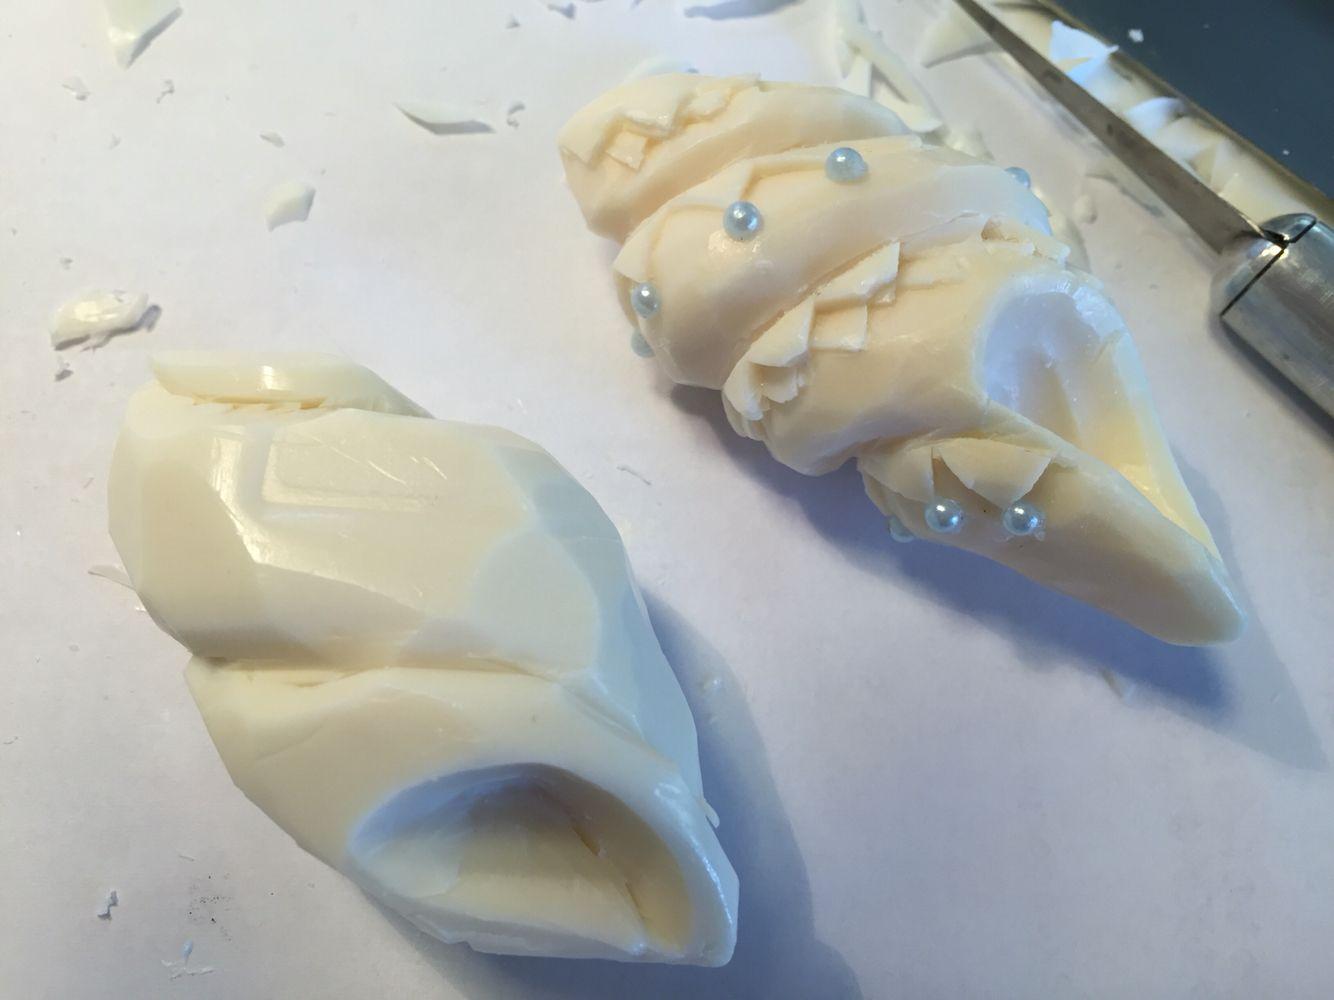 Soap carving no d design pinterest